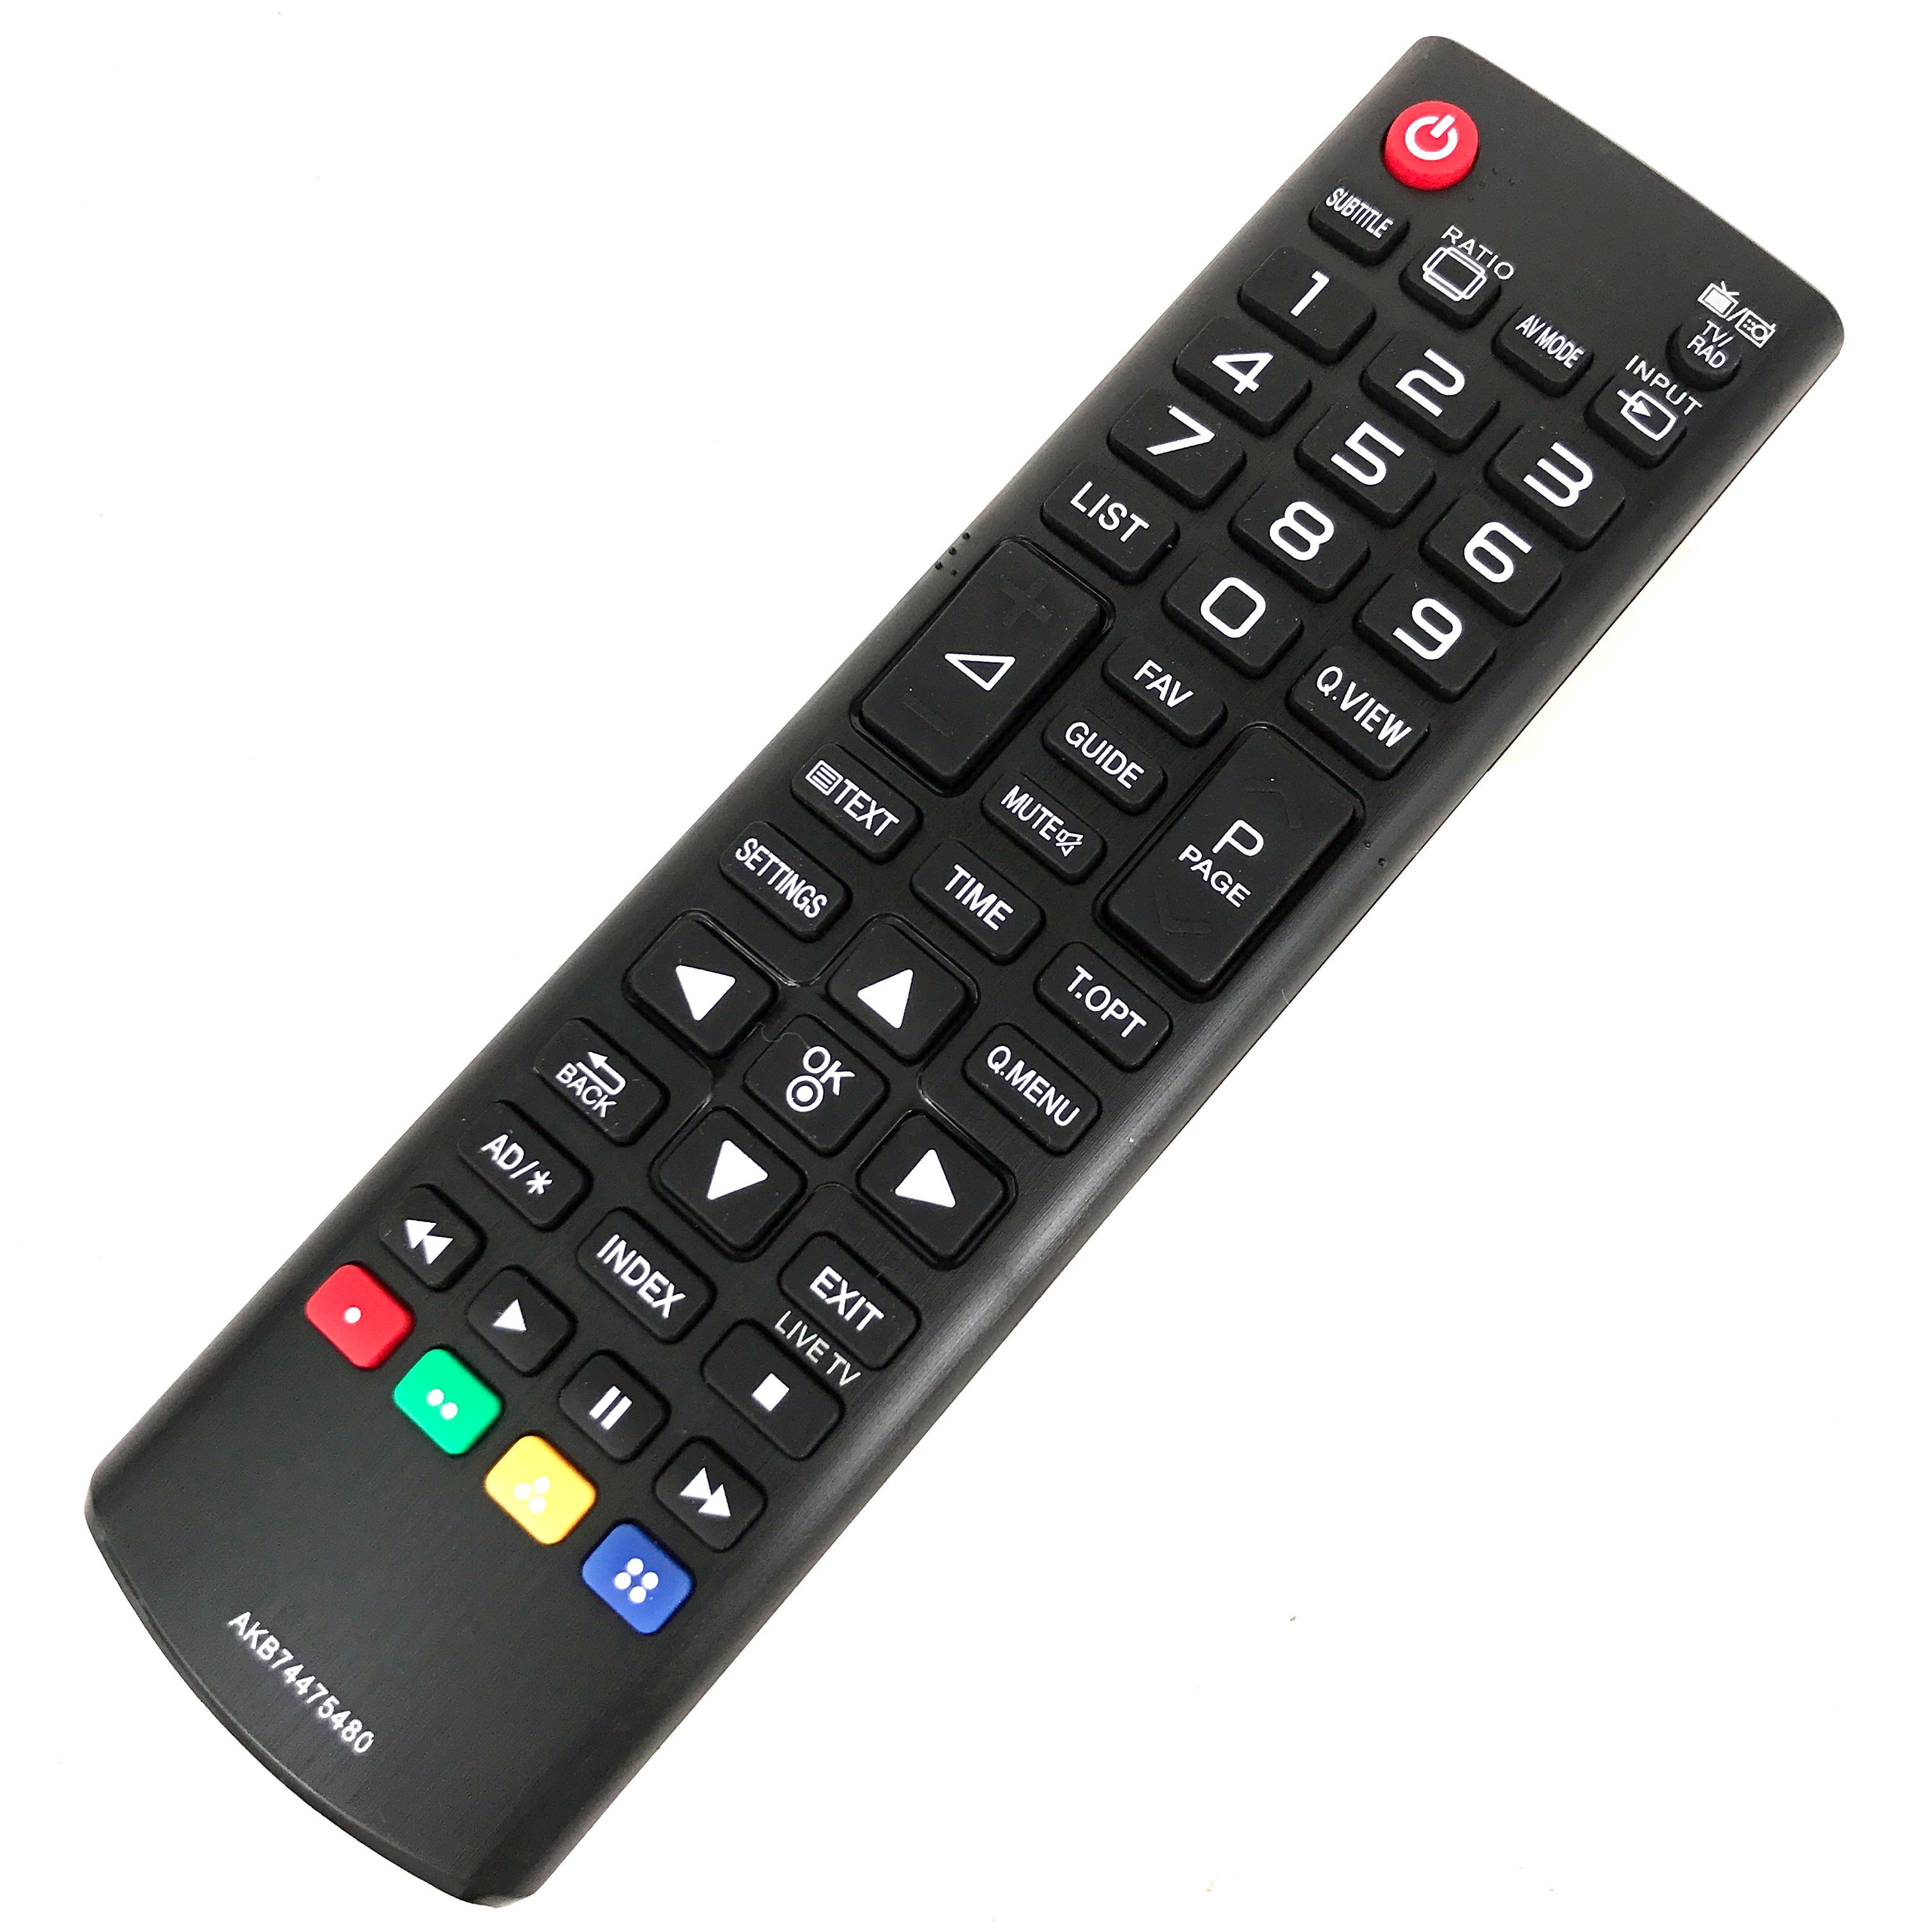 (2 pçs/lote) NOVO controle remoto Para LG LED TV LCD AKB74475480 Geral AKB73715603 AKB73715679 AKB73715622